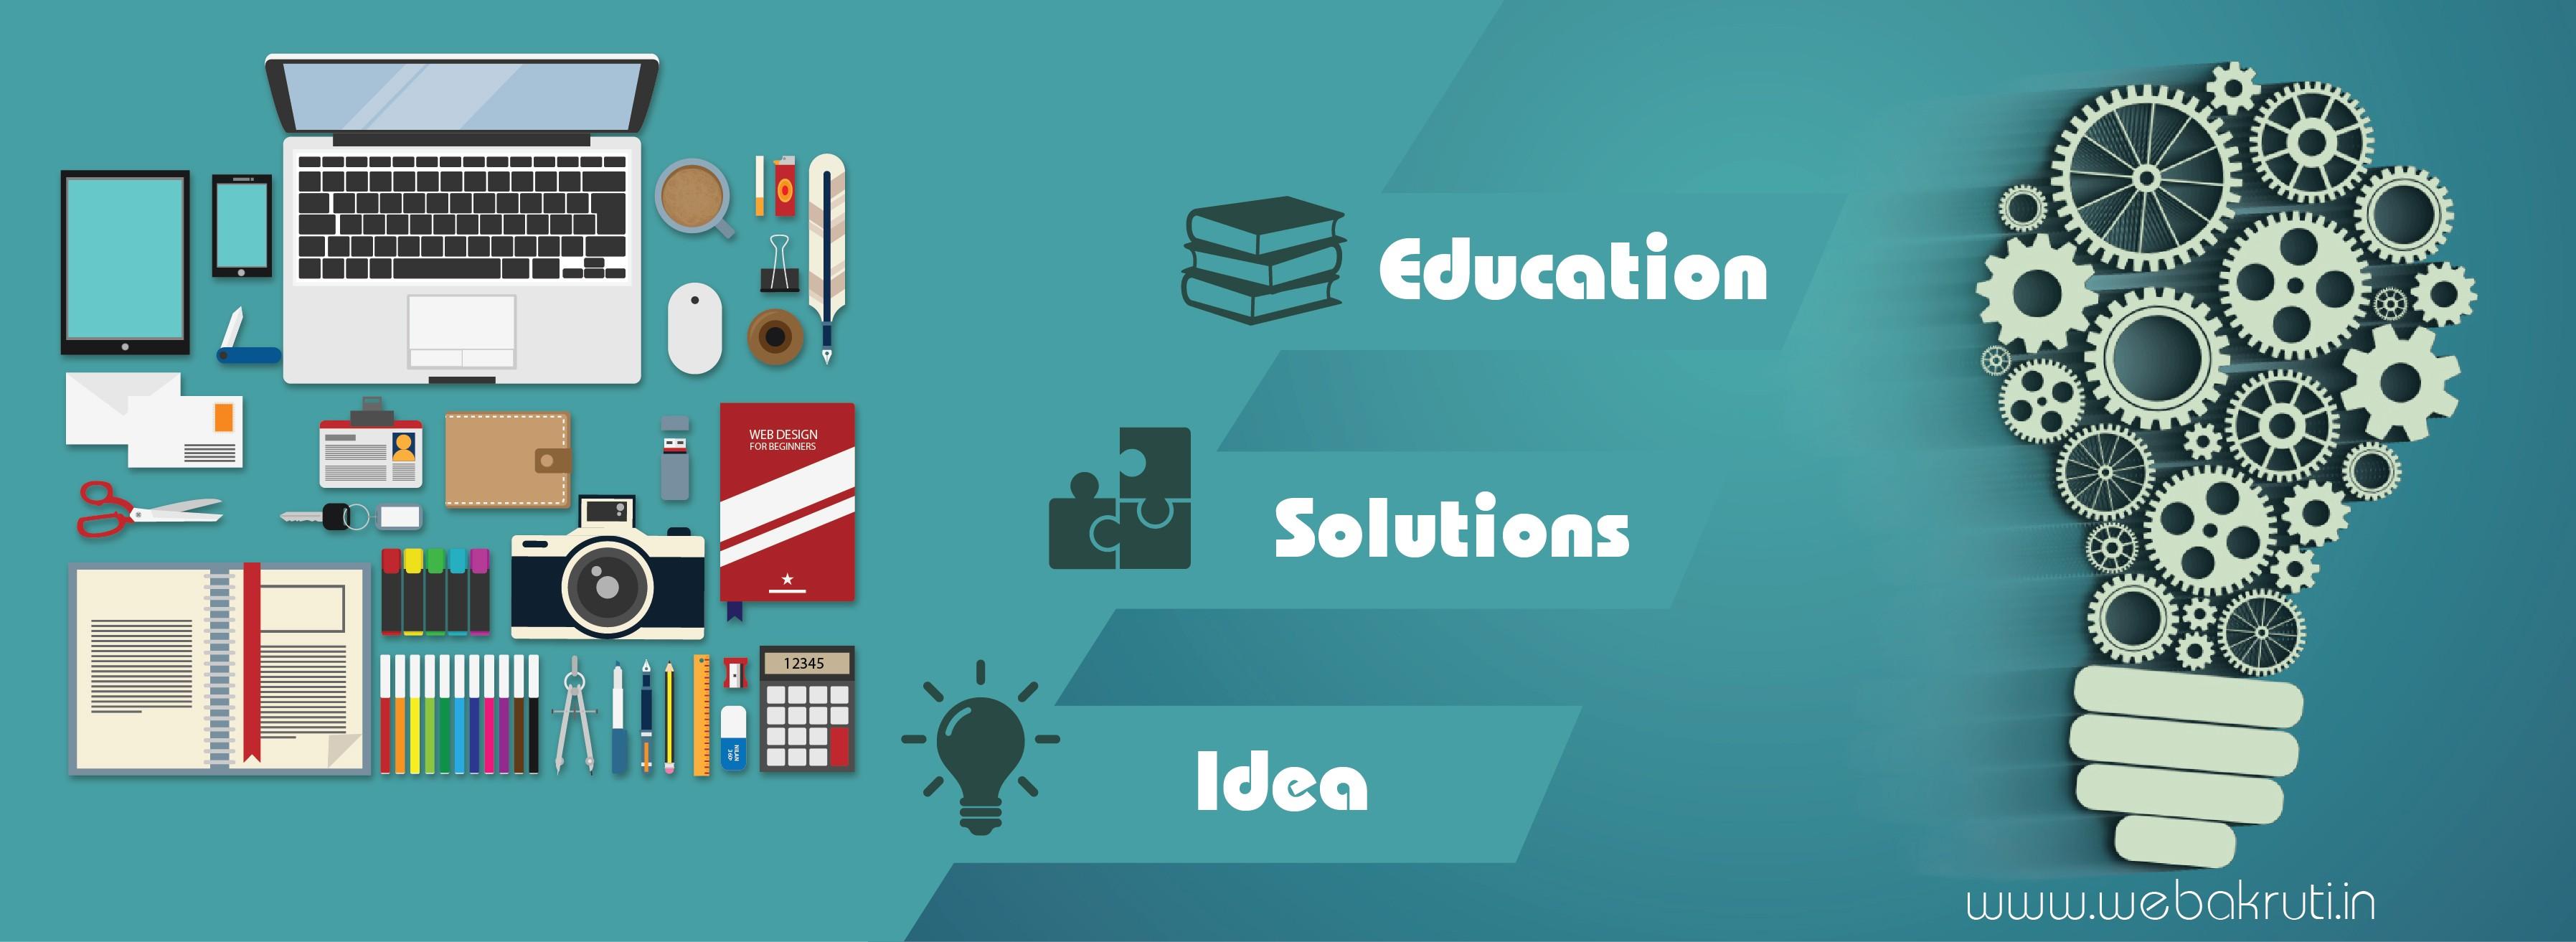 Webakruti - Web Application Design & Software Development Company